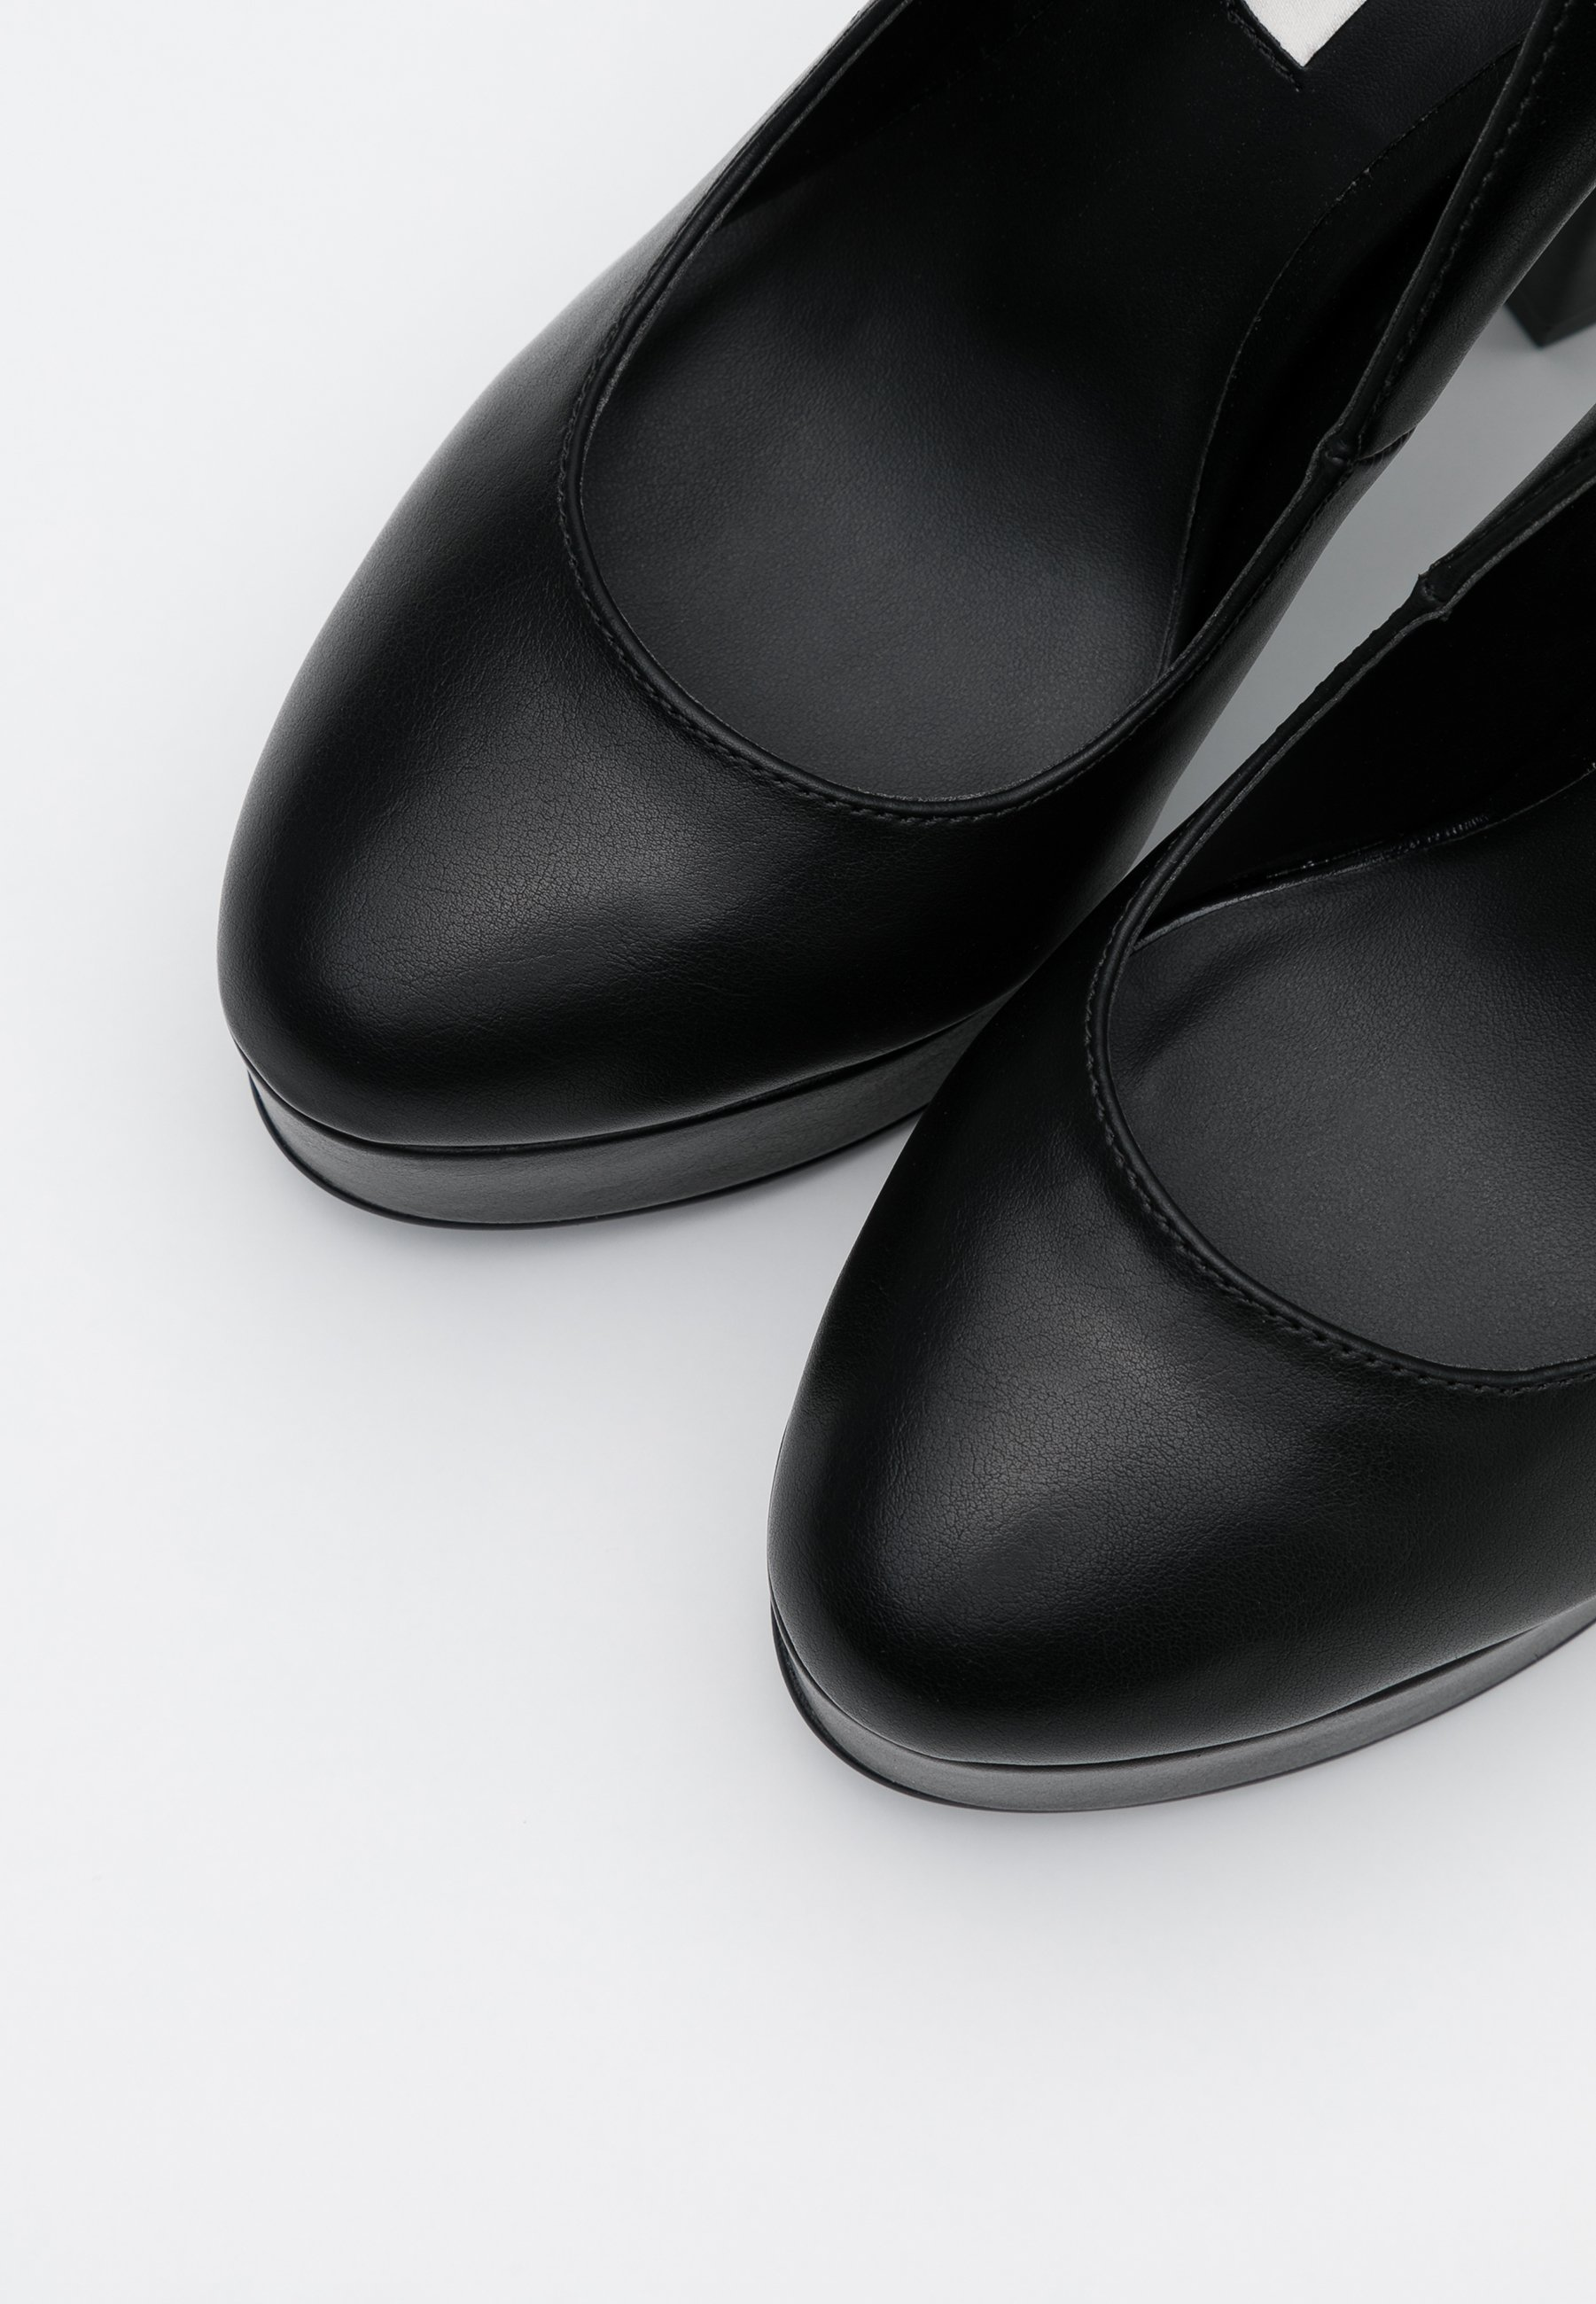 Even&odd High Heel Pumps - Black/schwarz